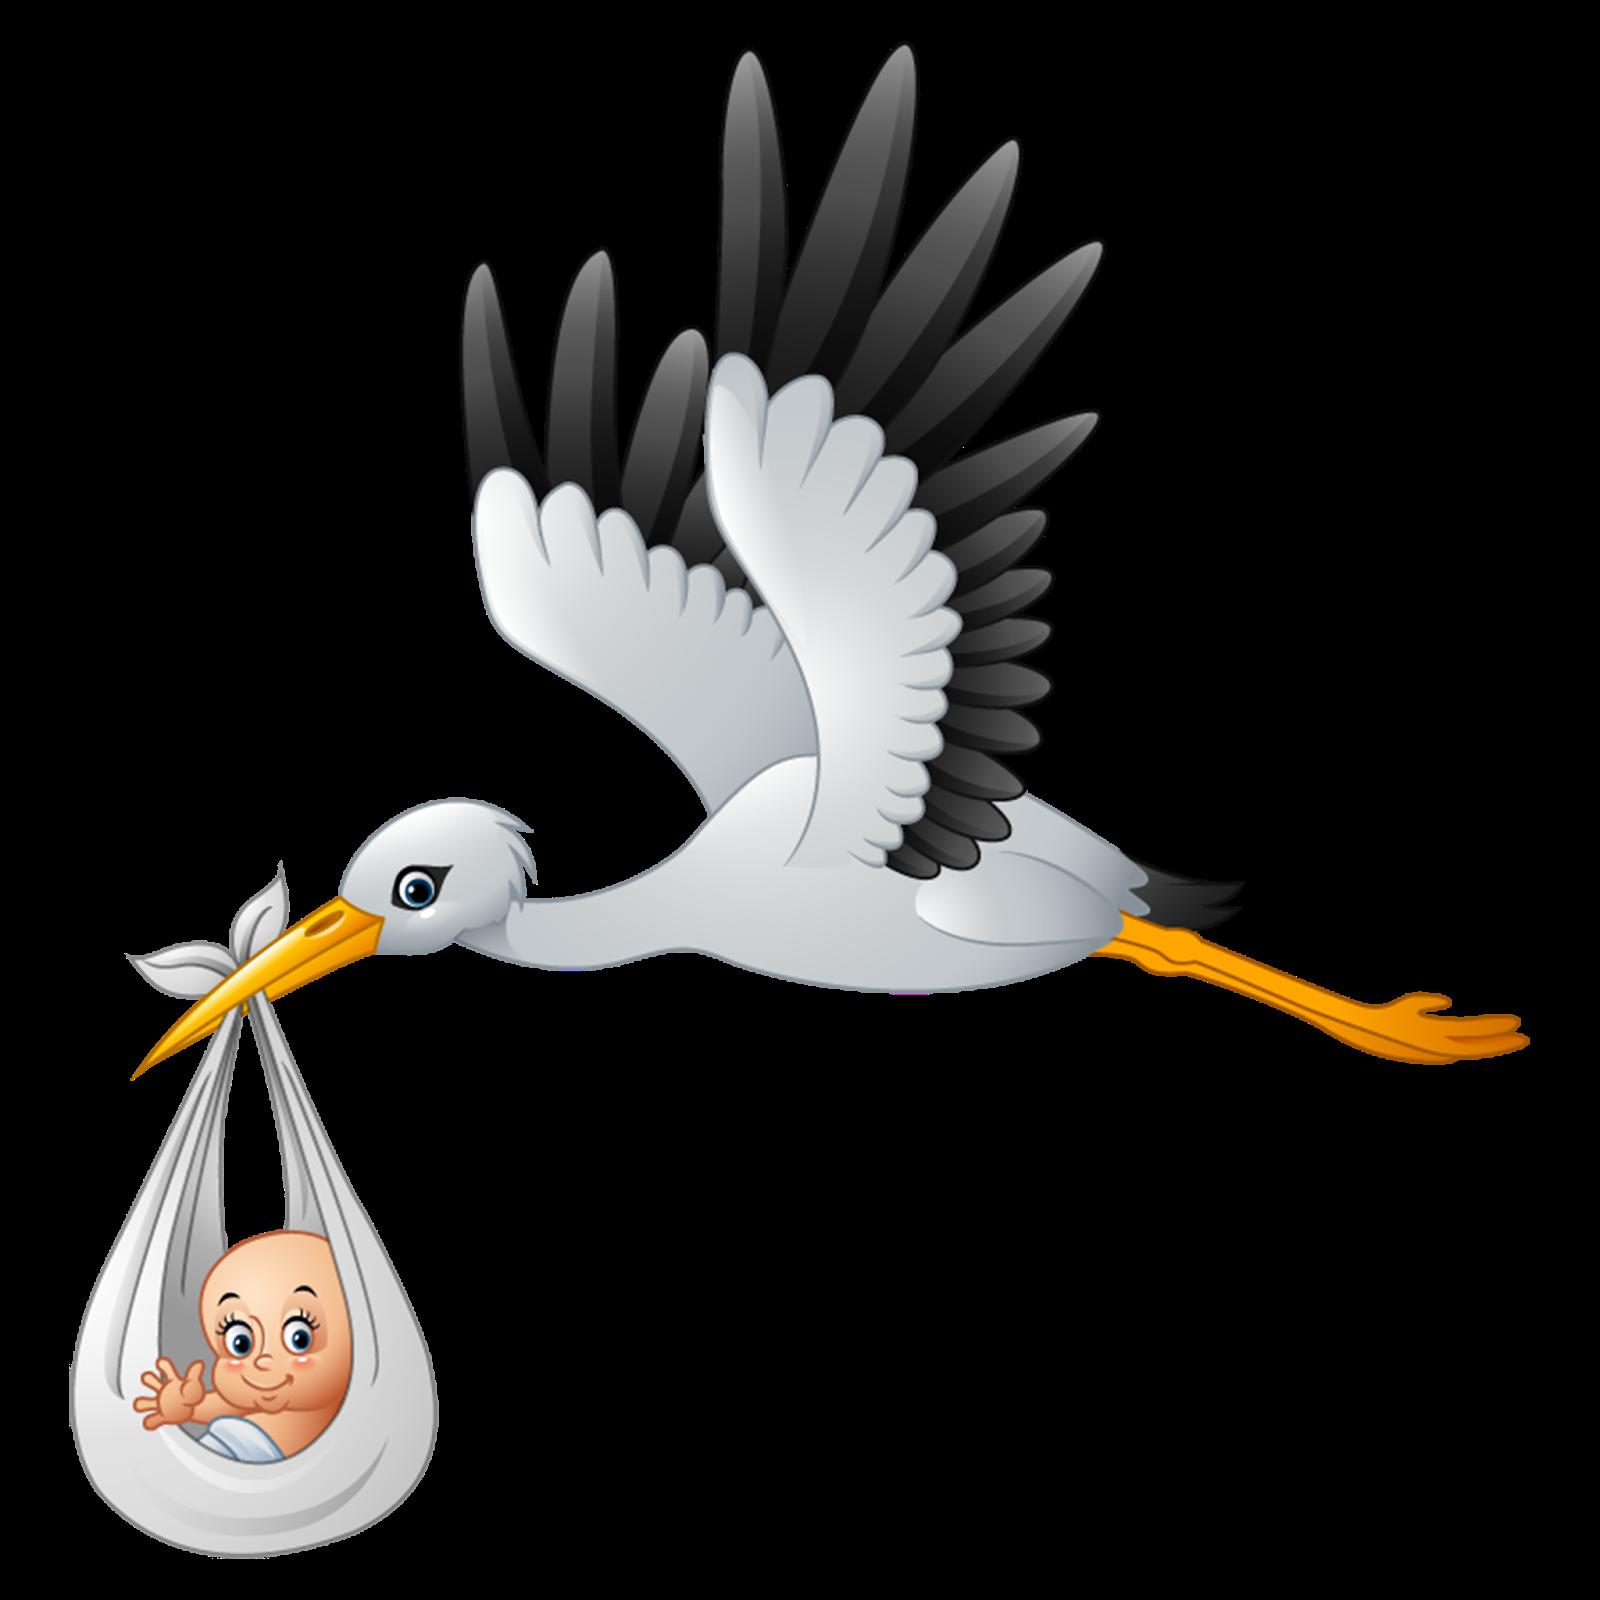 imagens png de cegonhas imagens para photoshop stork delivering baby clip art stork carrying baby clipart